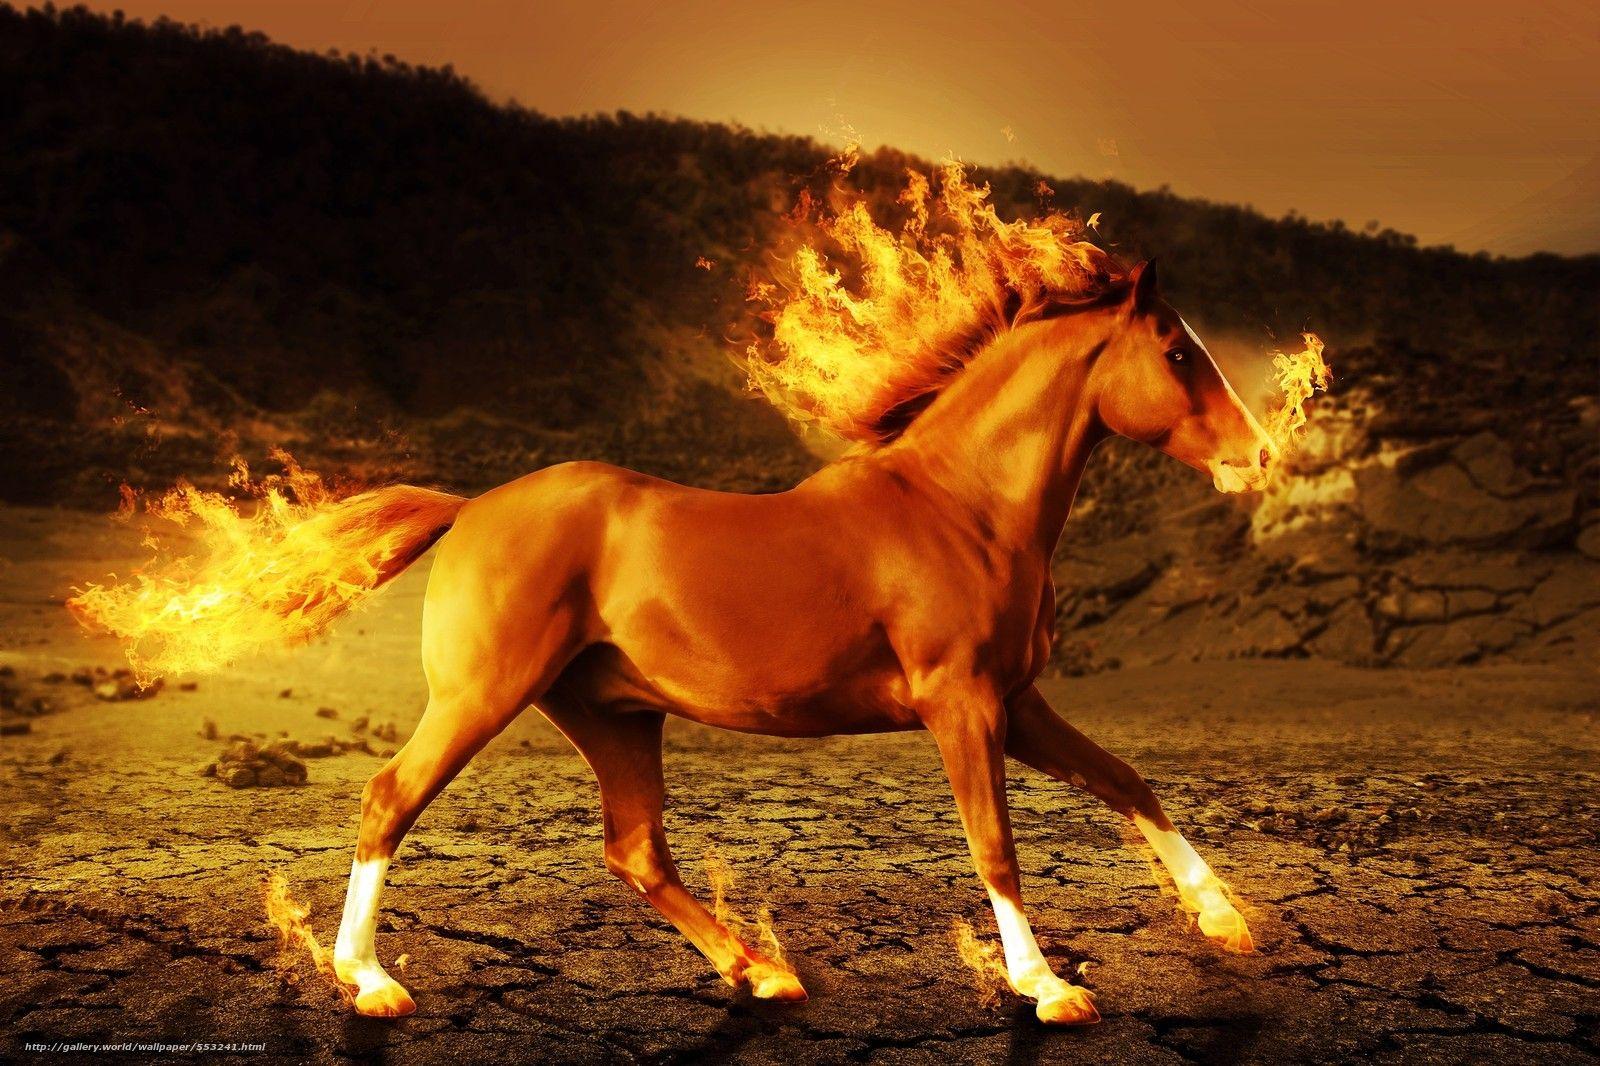 Top Wallpaper Horse Android - 39be0990e016b6e606a396830ef06d0f  Trends_573121.jpg